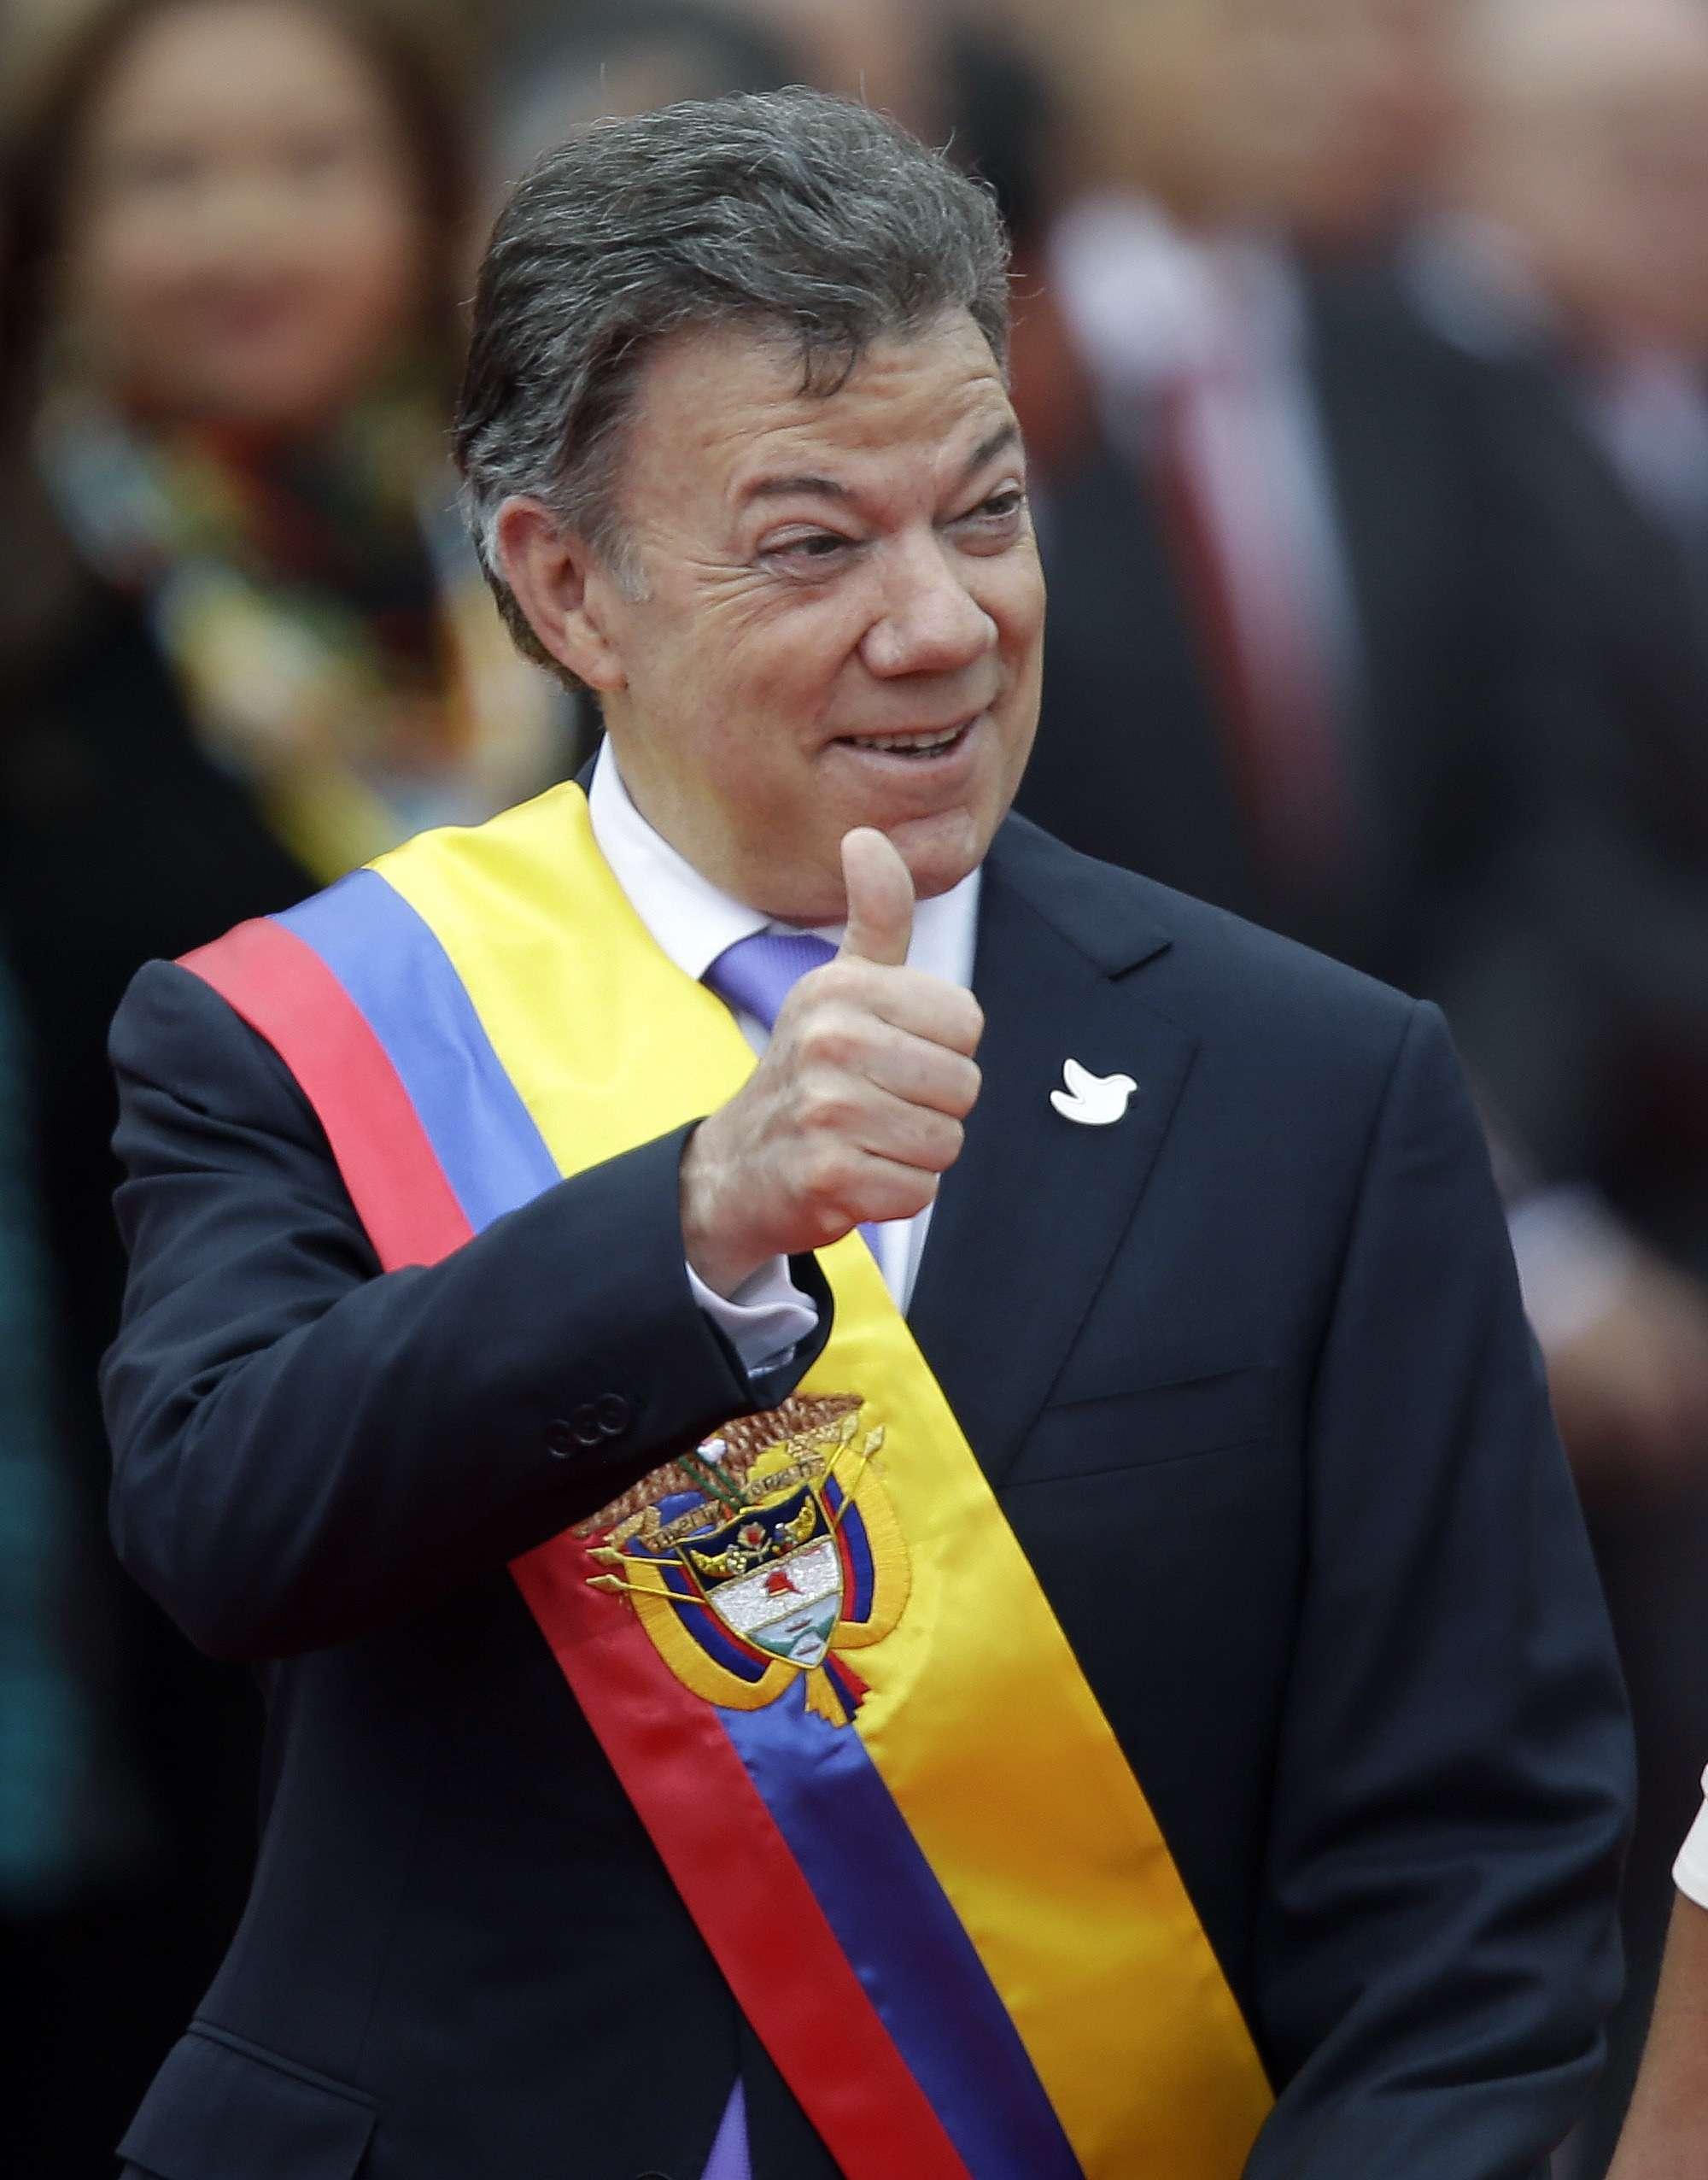 Foto: AP en español